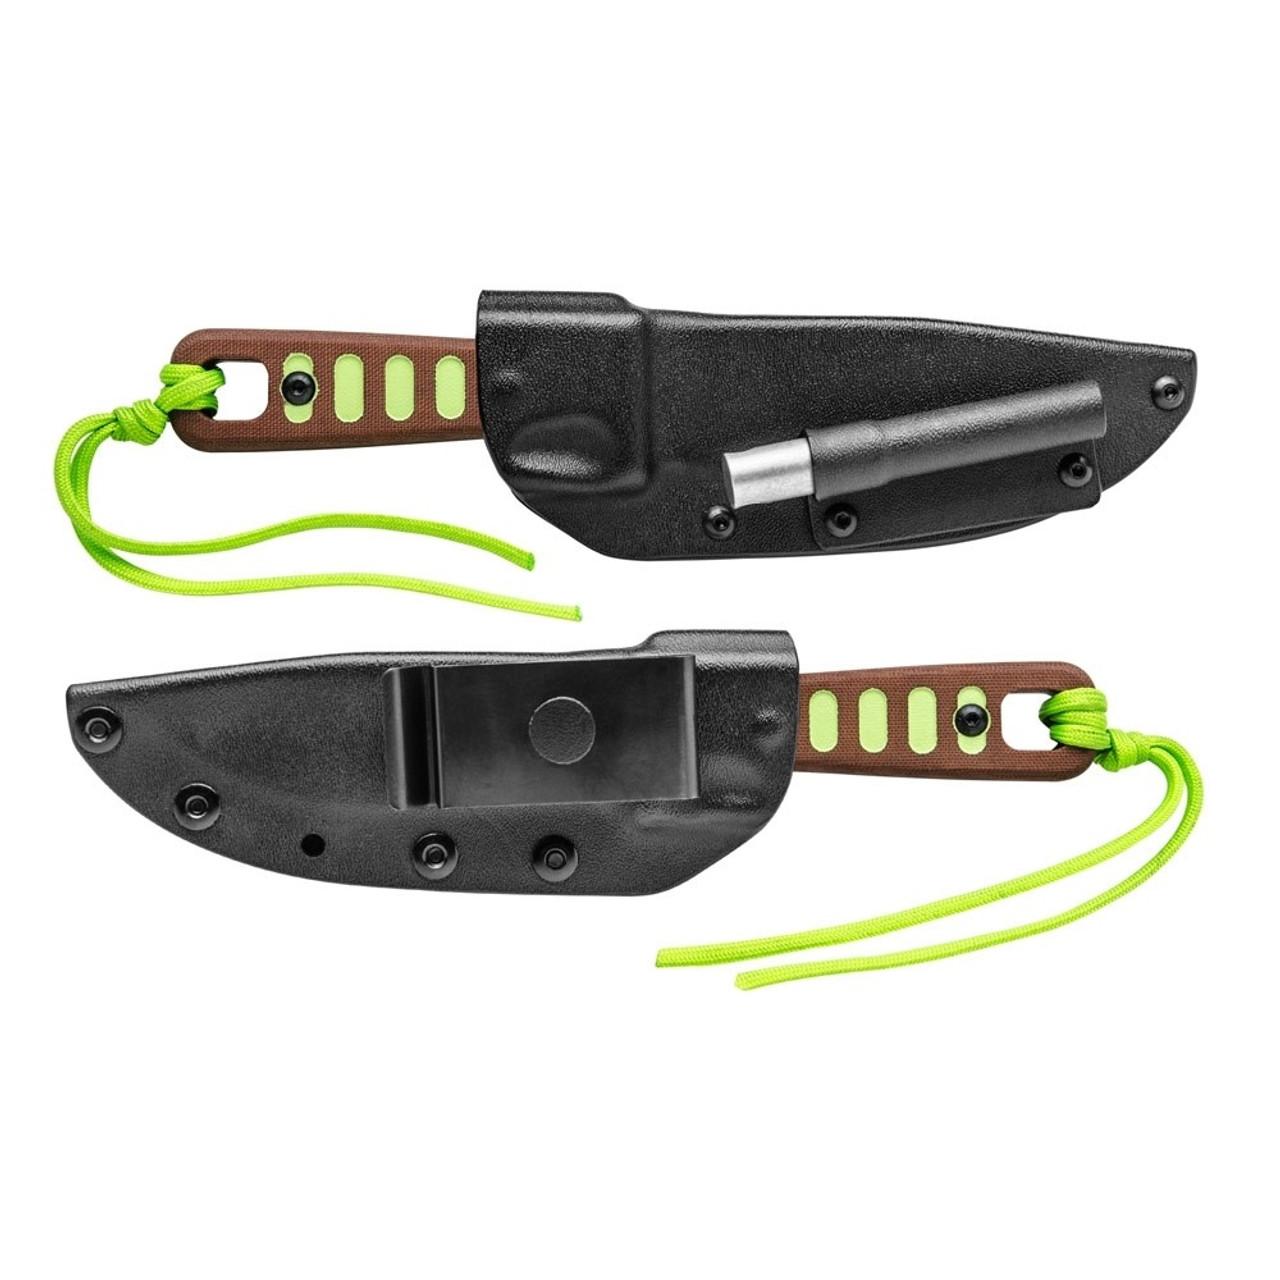 TOPS Survival Green Lite Trekker Fixed Blade Knife, Black Blade SHEATH VIEW